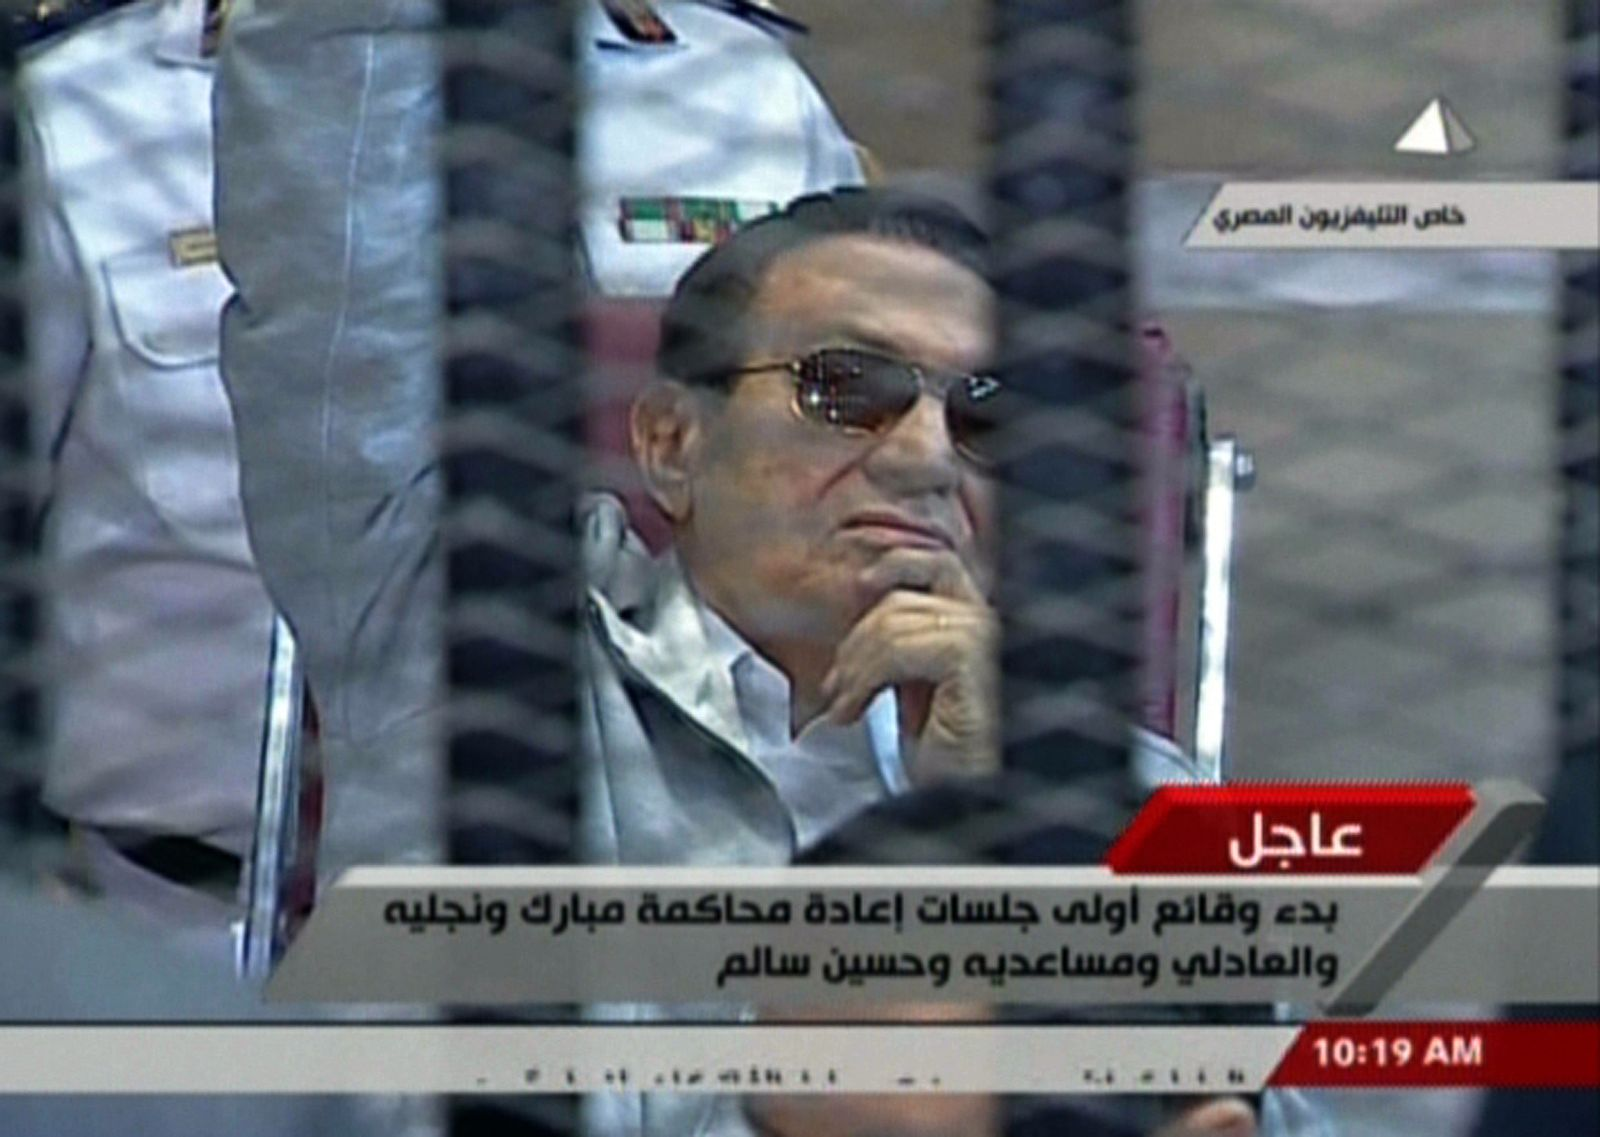 Hosni Mubarak/ Gerichtsverhandlung